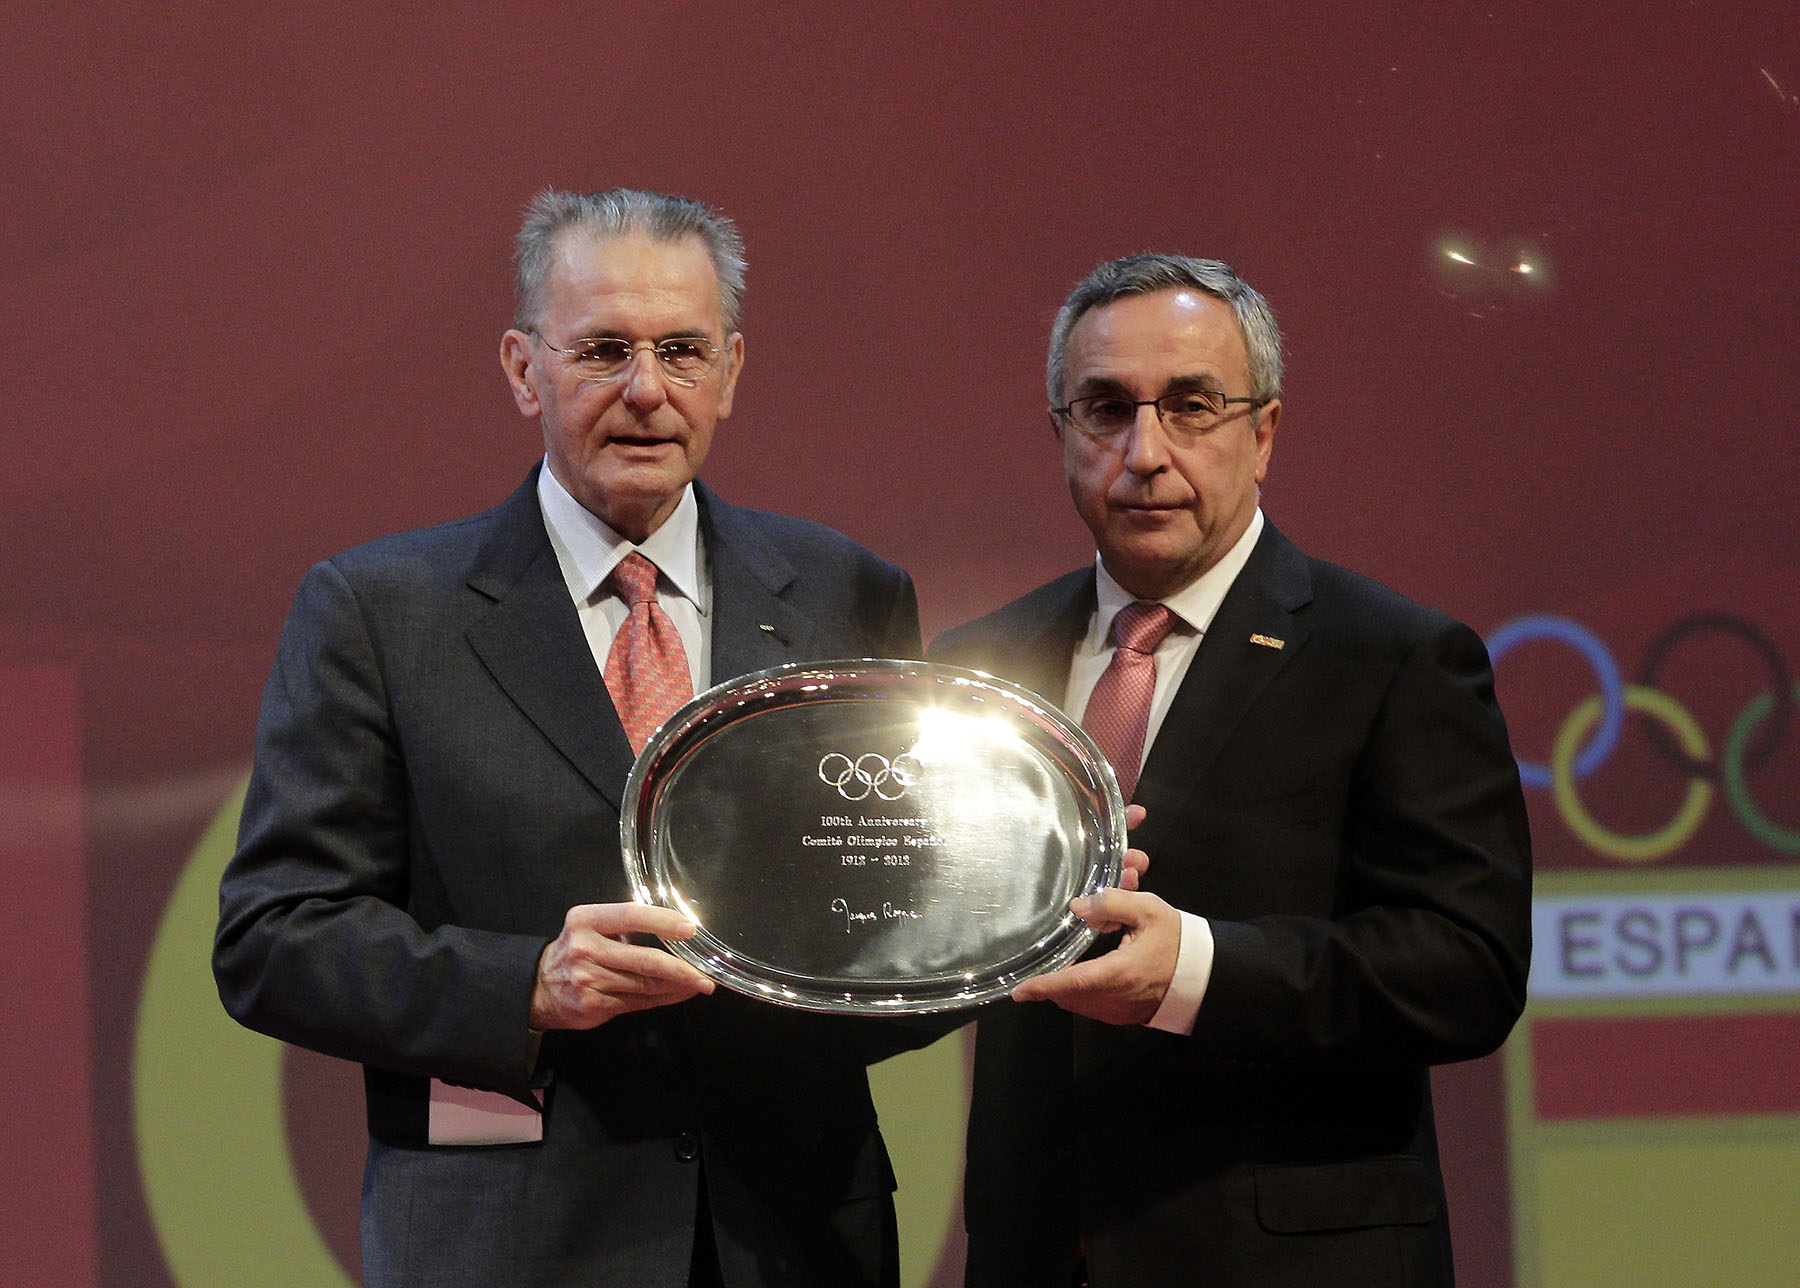 Jacques Rogge with Alejandro Blanco COE Centenary December 12 2012